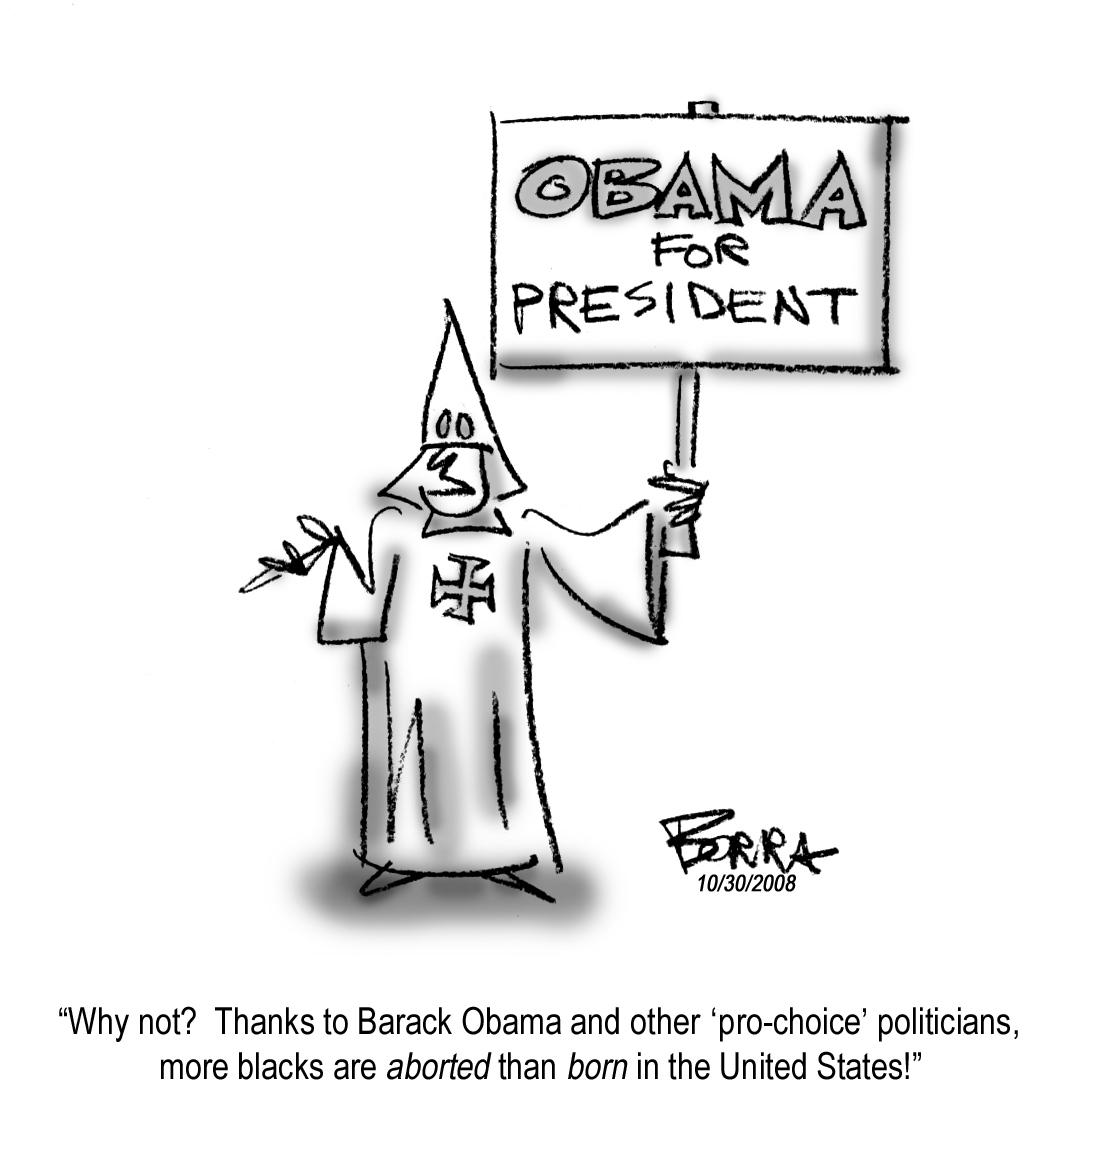 [Klansmen+for+Obama+2.jpg]